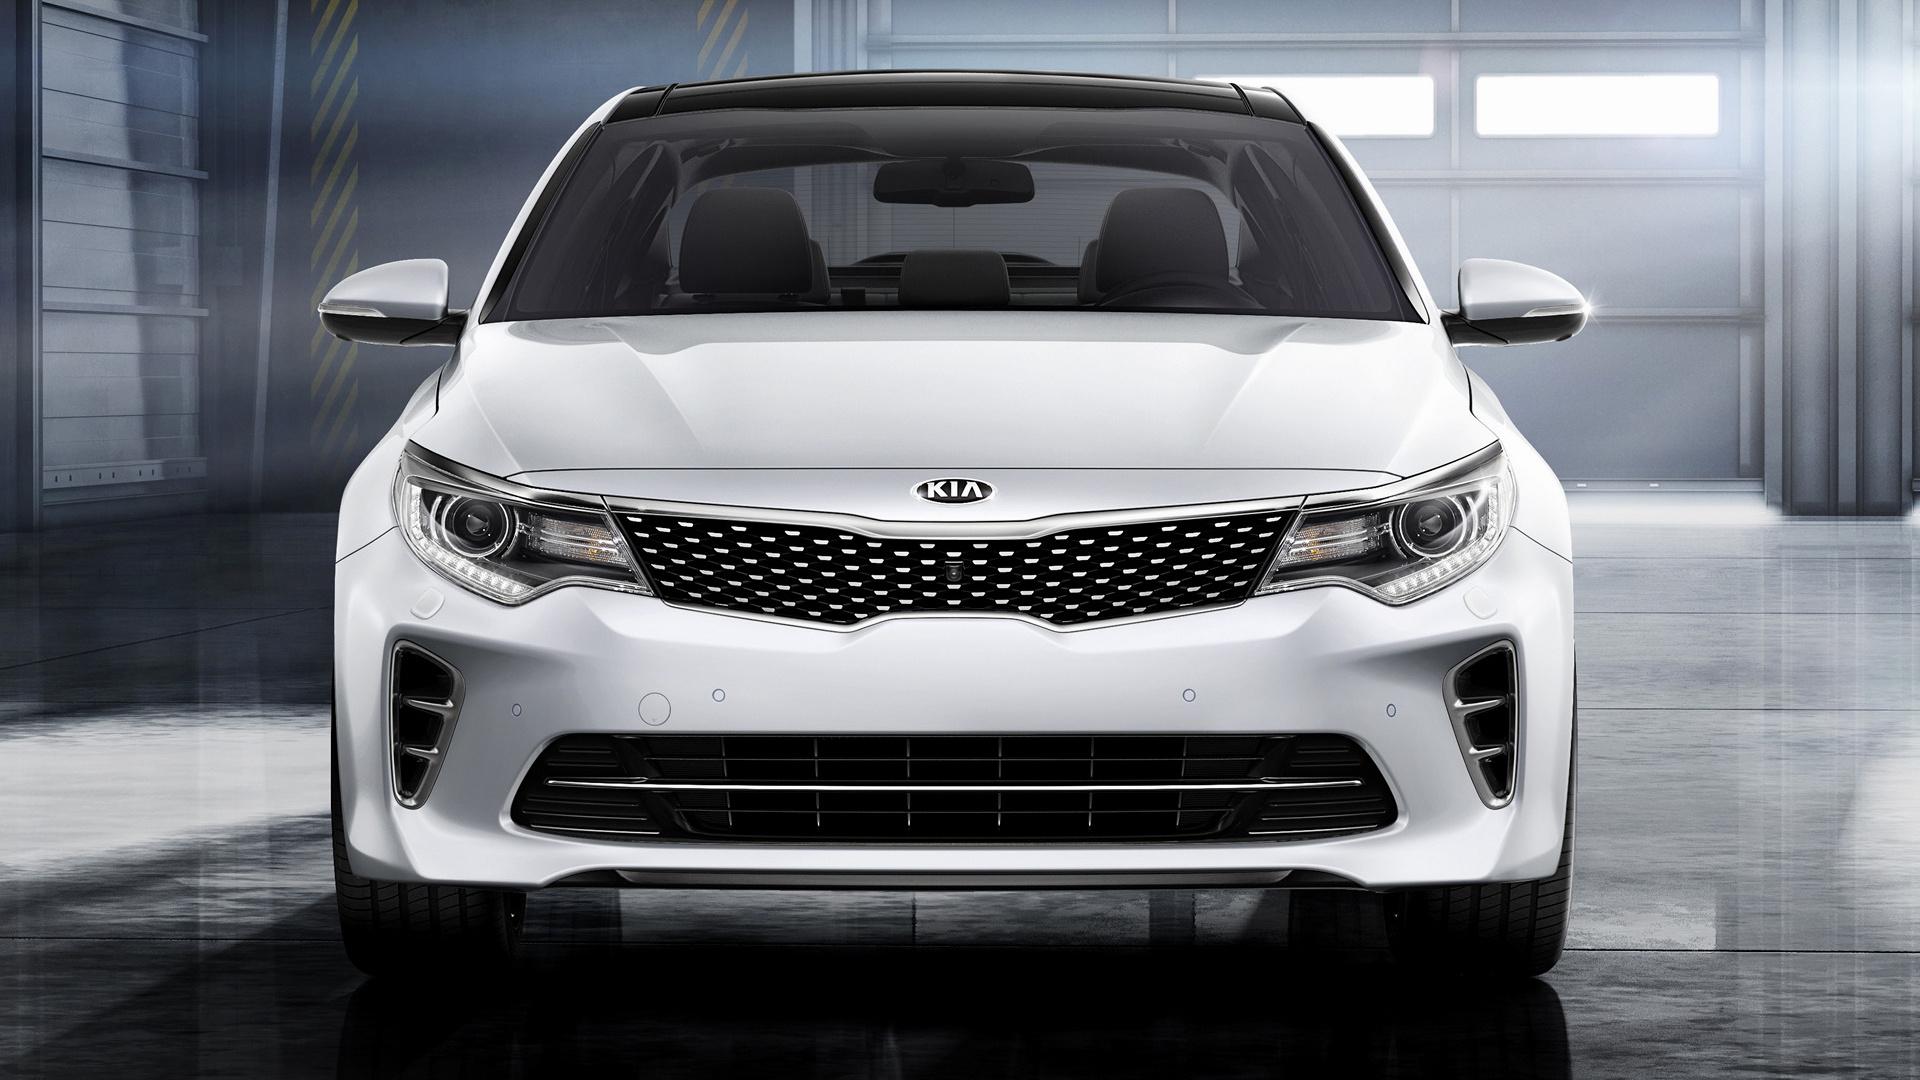 2016 Kia Optima Hybrid >> Kia Optima GT (2016) EU Wallpapers and HD Images - Car Pixel